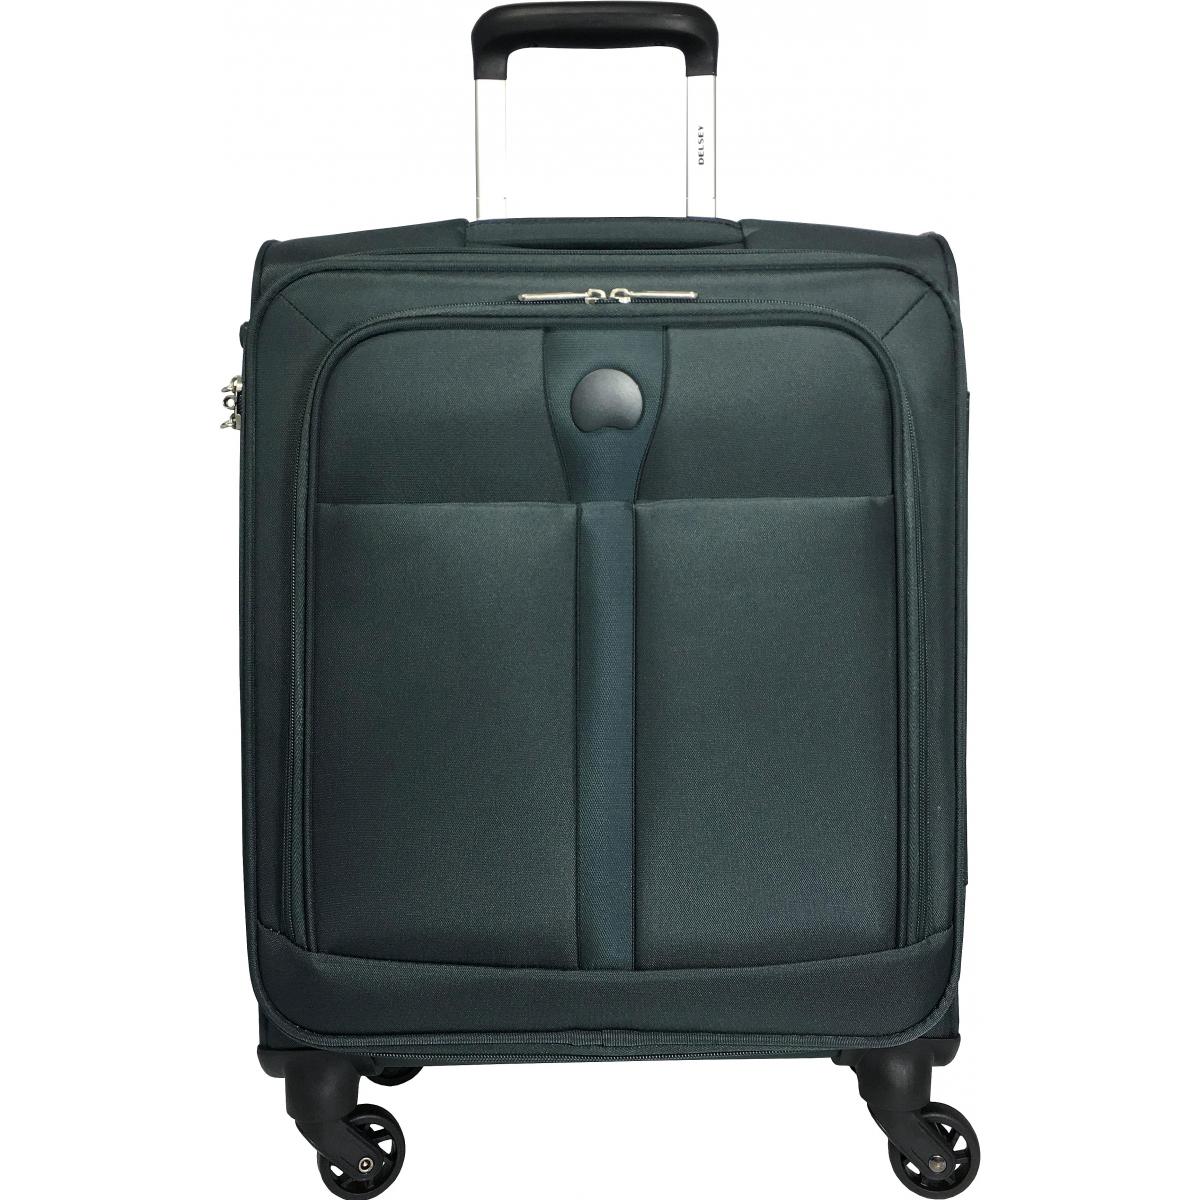 valise cabine souple tsa delsey maloti 55 cm maloti 803 couleur principale gris 11. Black Bedroom Furniture Sets. Home Design Ideas